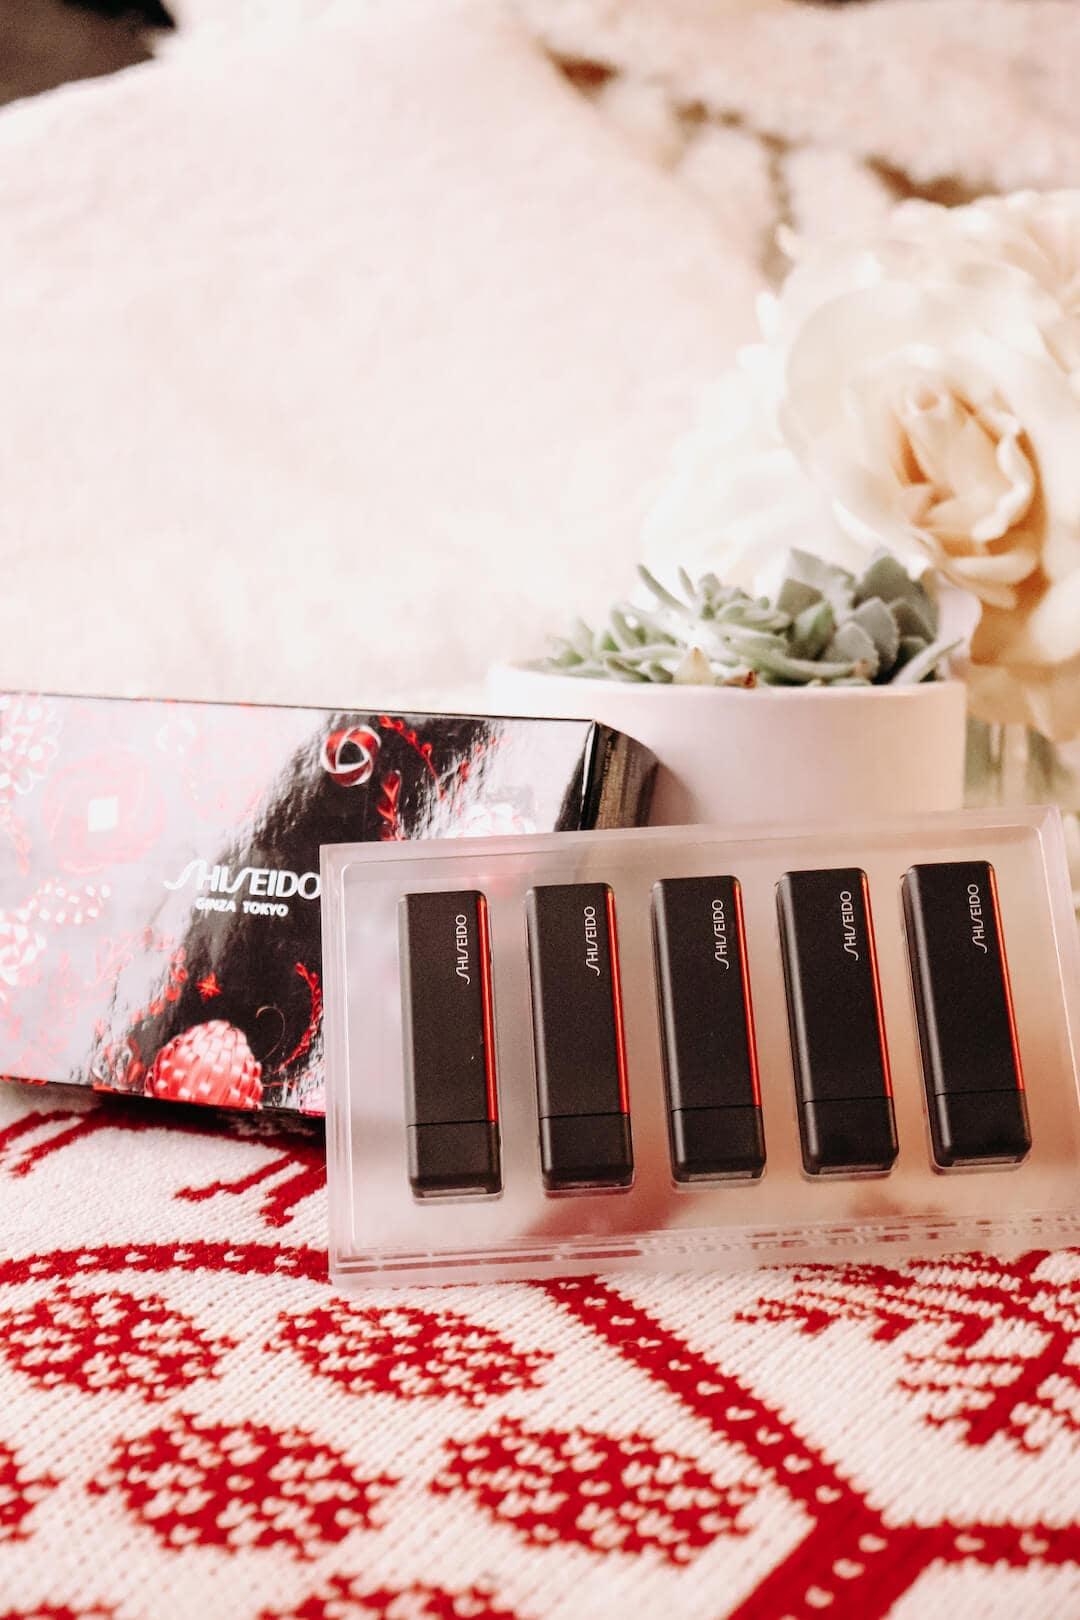 shiseido-modernmatte-lipstick-gift-set-sephora-2018